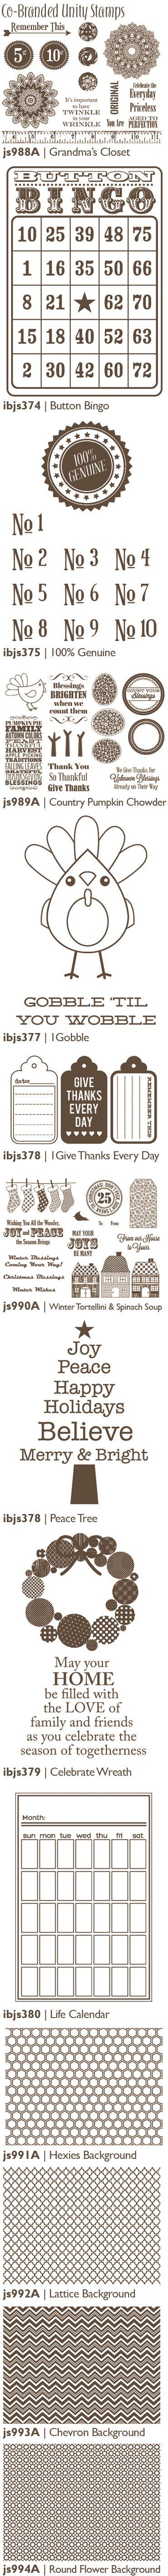 Co-Branded Unity Stamps Summer 2012 by Jillibean Soup (via the Jillibean Soup blog).